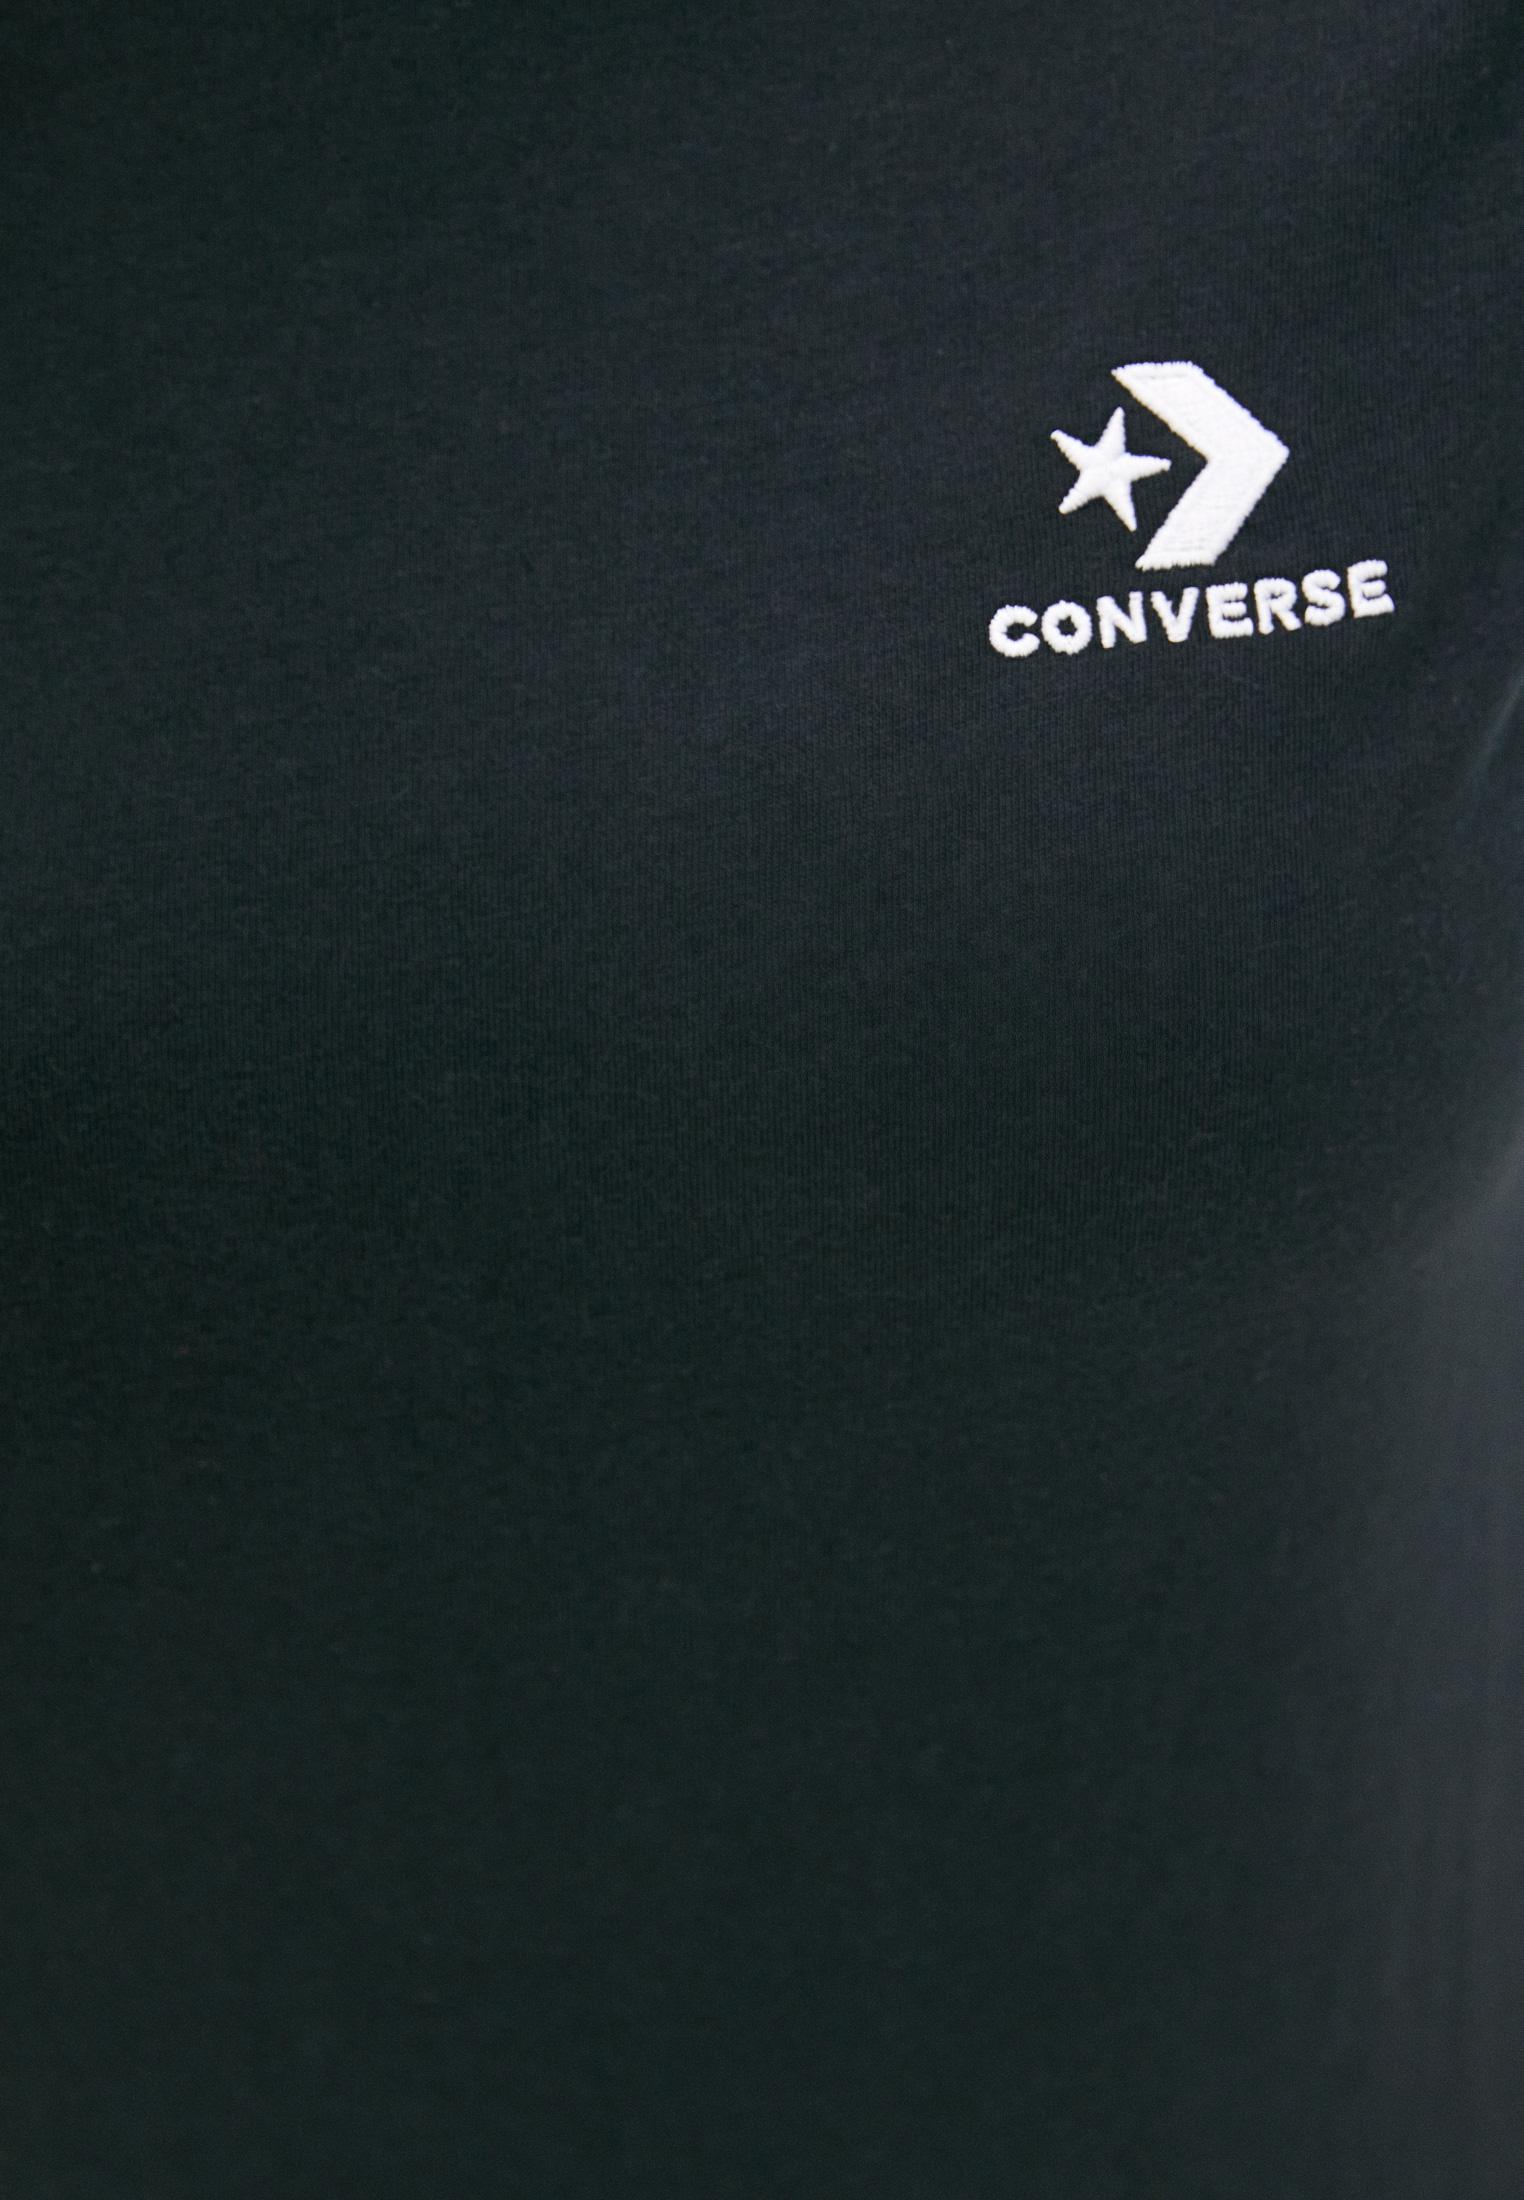 Футболка с коротким рукавом Converse (Конверс) 10020804001: изображение 3